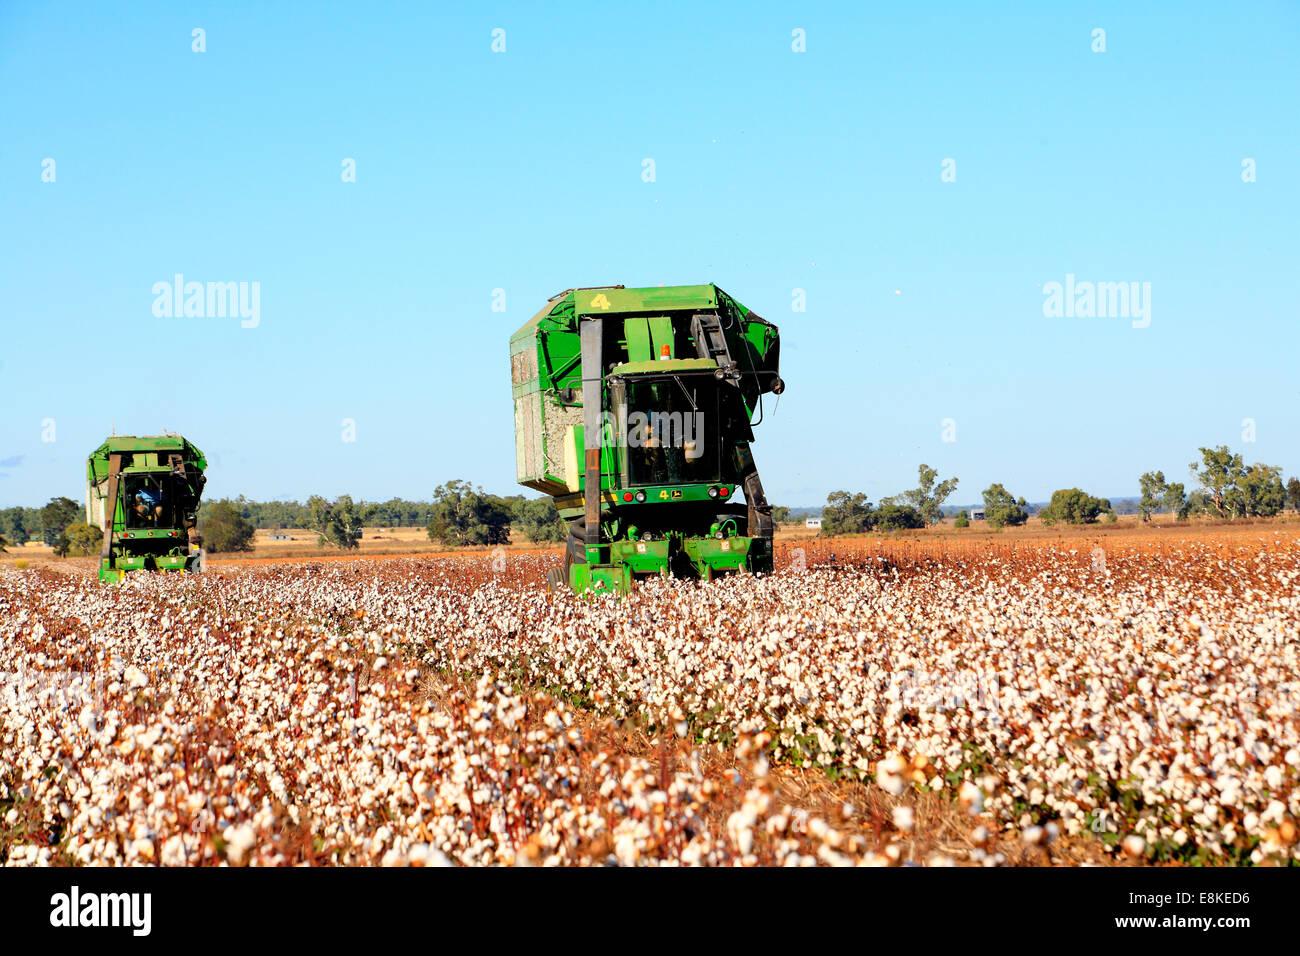 two-john-deere-cotton-harvesting-machines-narrabri-western-plains-E8KED6.jpg